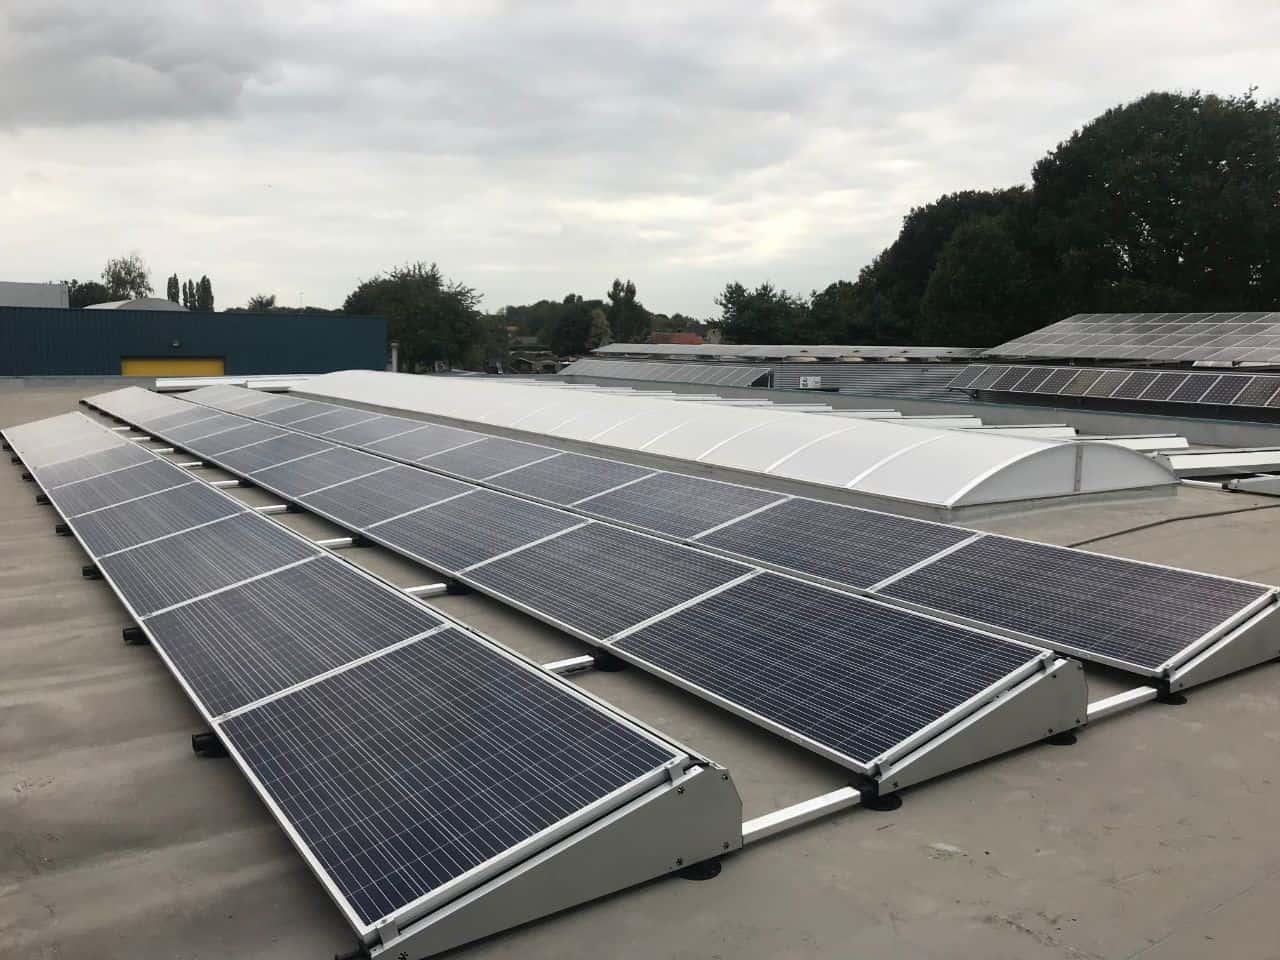 Zonnepanelen pakket plat dak zonnepanelen zonnepanelen op een